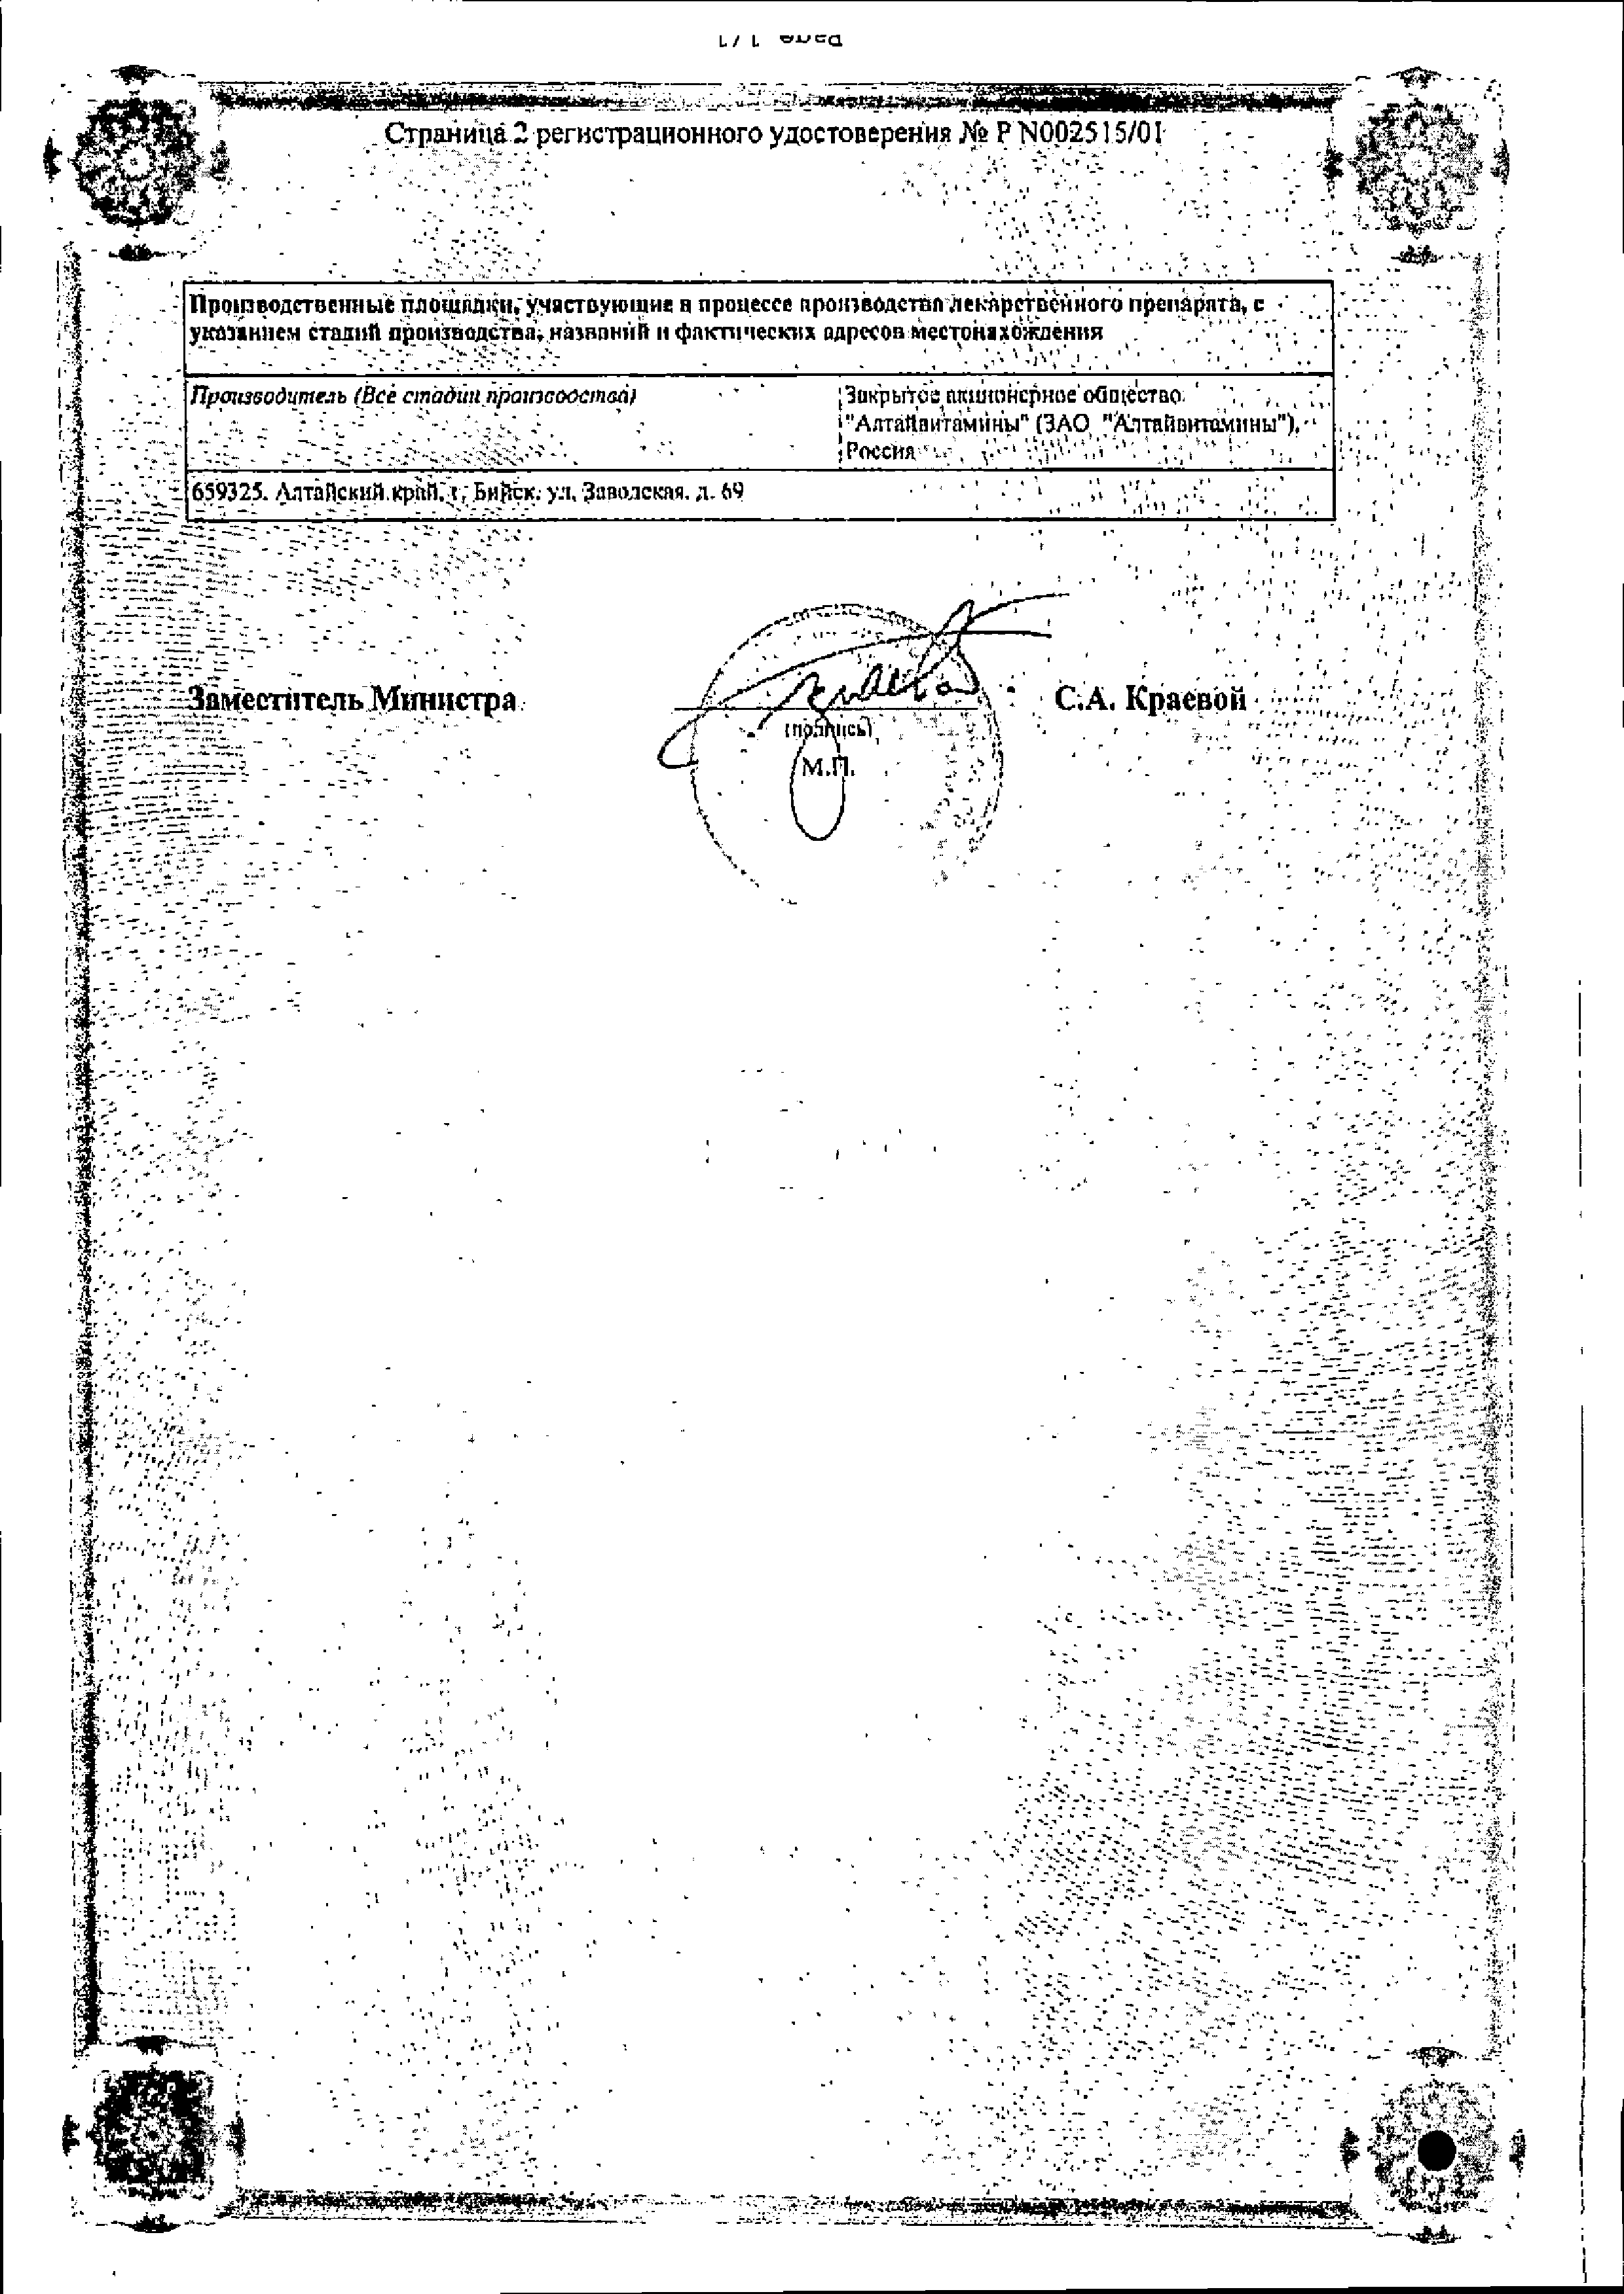 Ингалипт сертификат